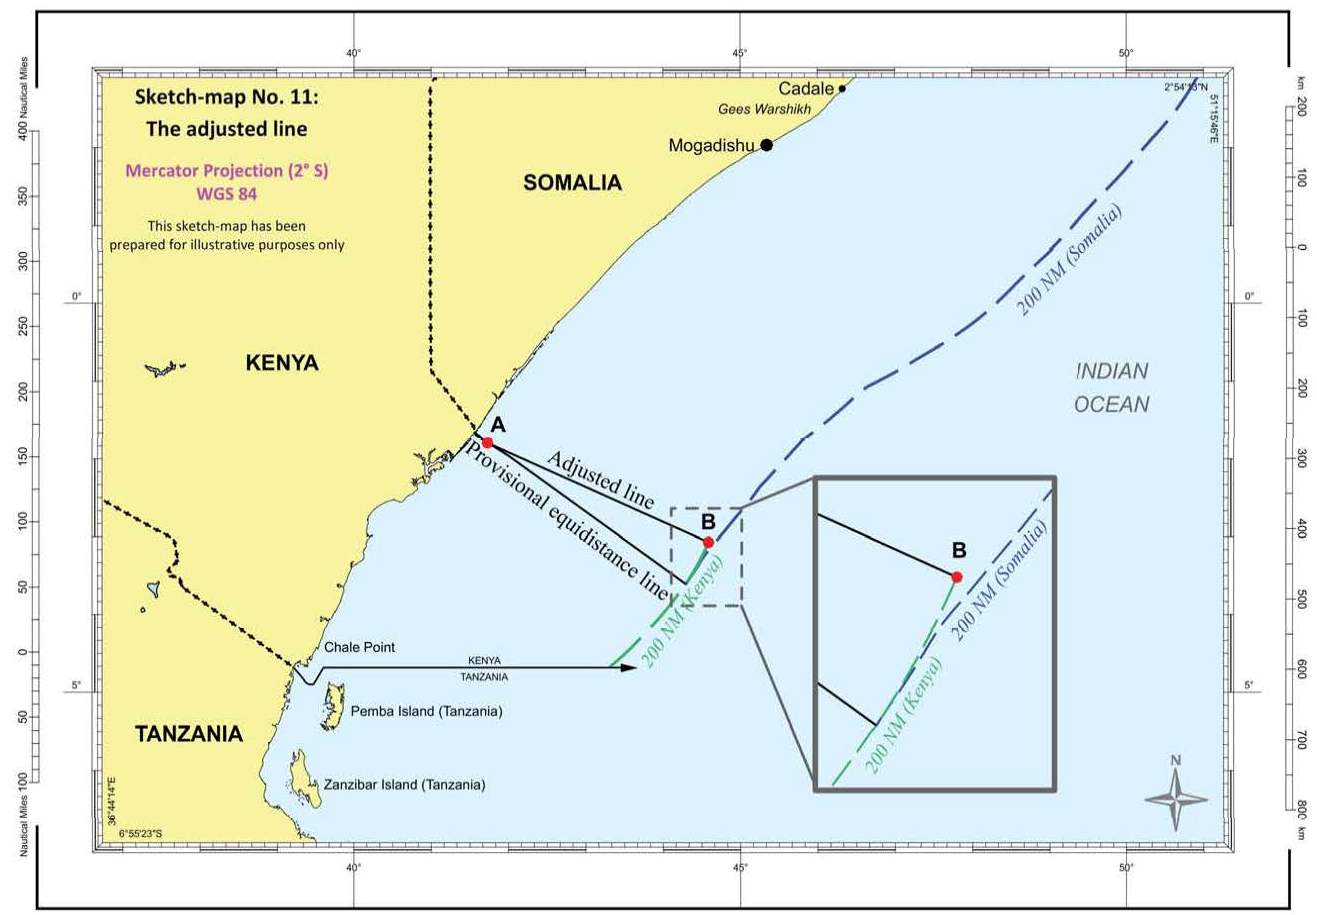 12 OCTOBER 2021 JUDGMENT MARITIME DELIMITATION IN THE INDIAN OCEAN (SOMALIA v. KENYA)